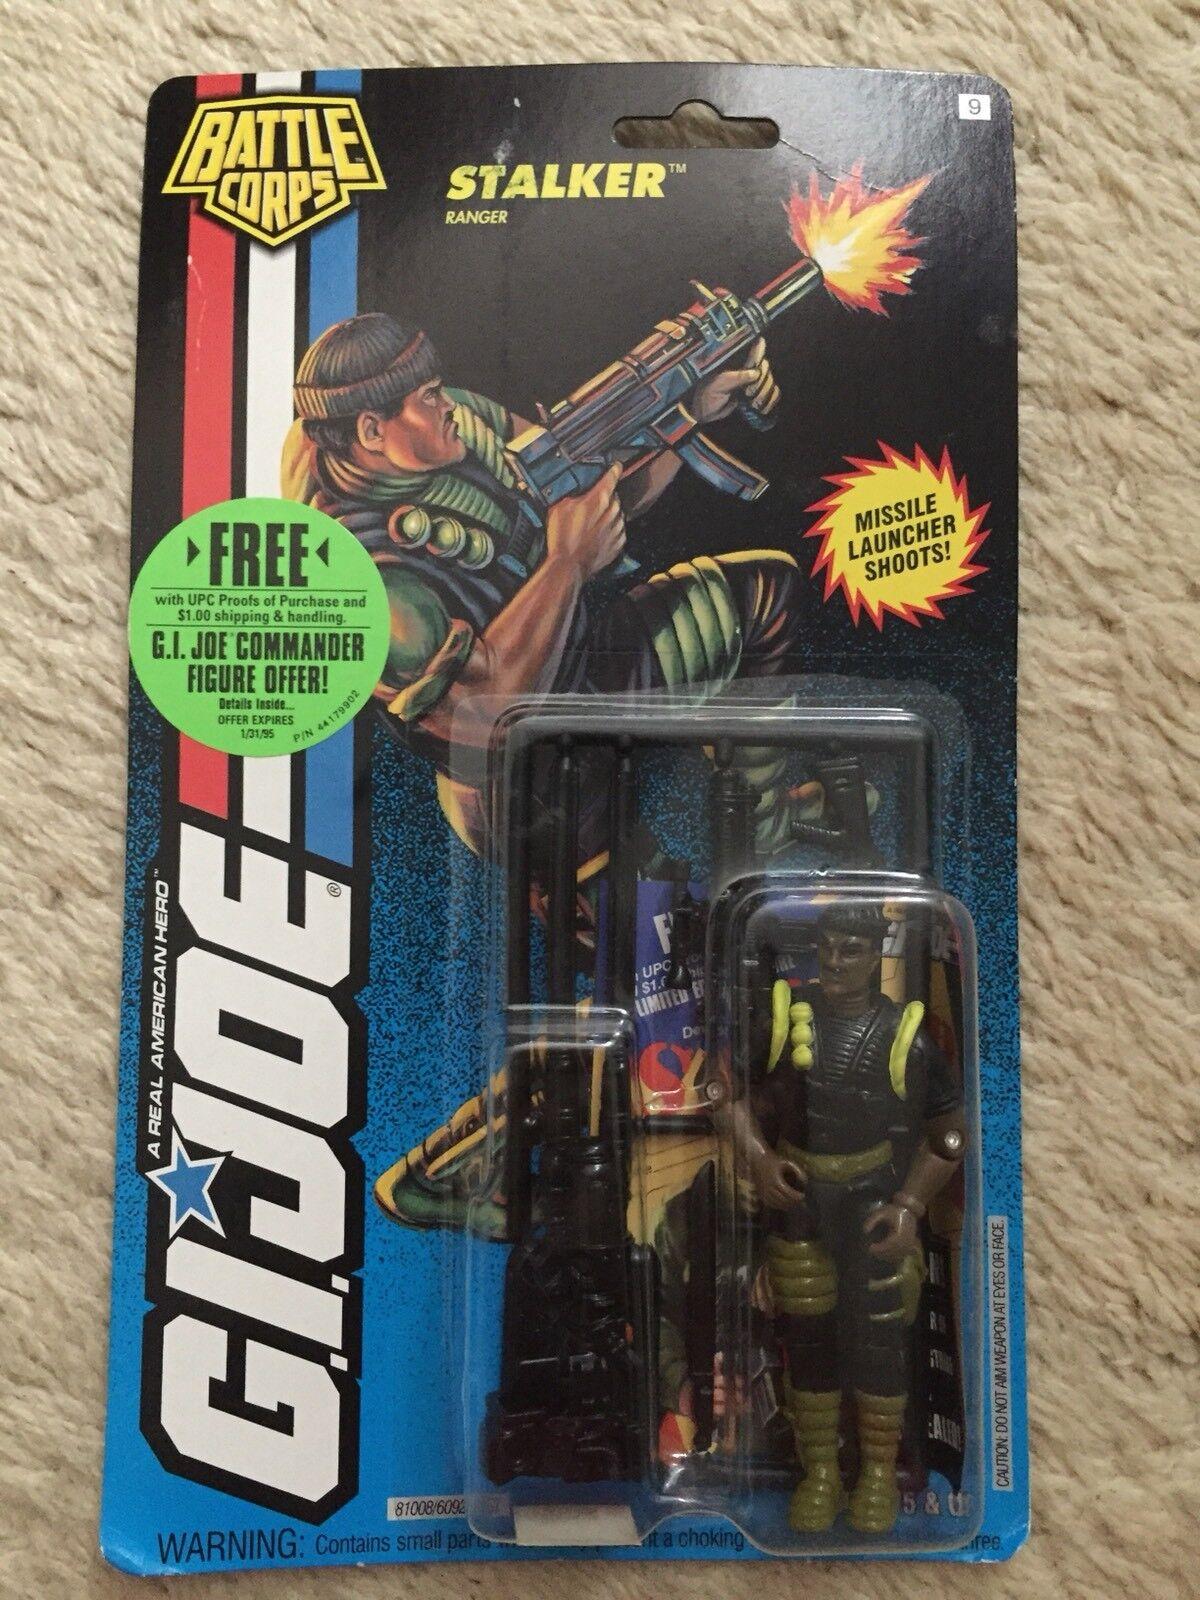 GI Joe Cobra Battle Corps Stalker MOC Carded New